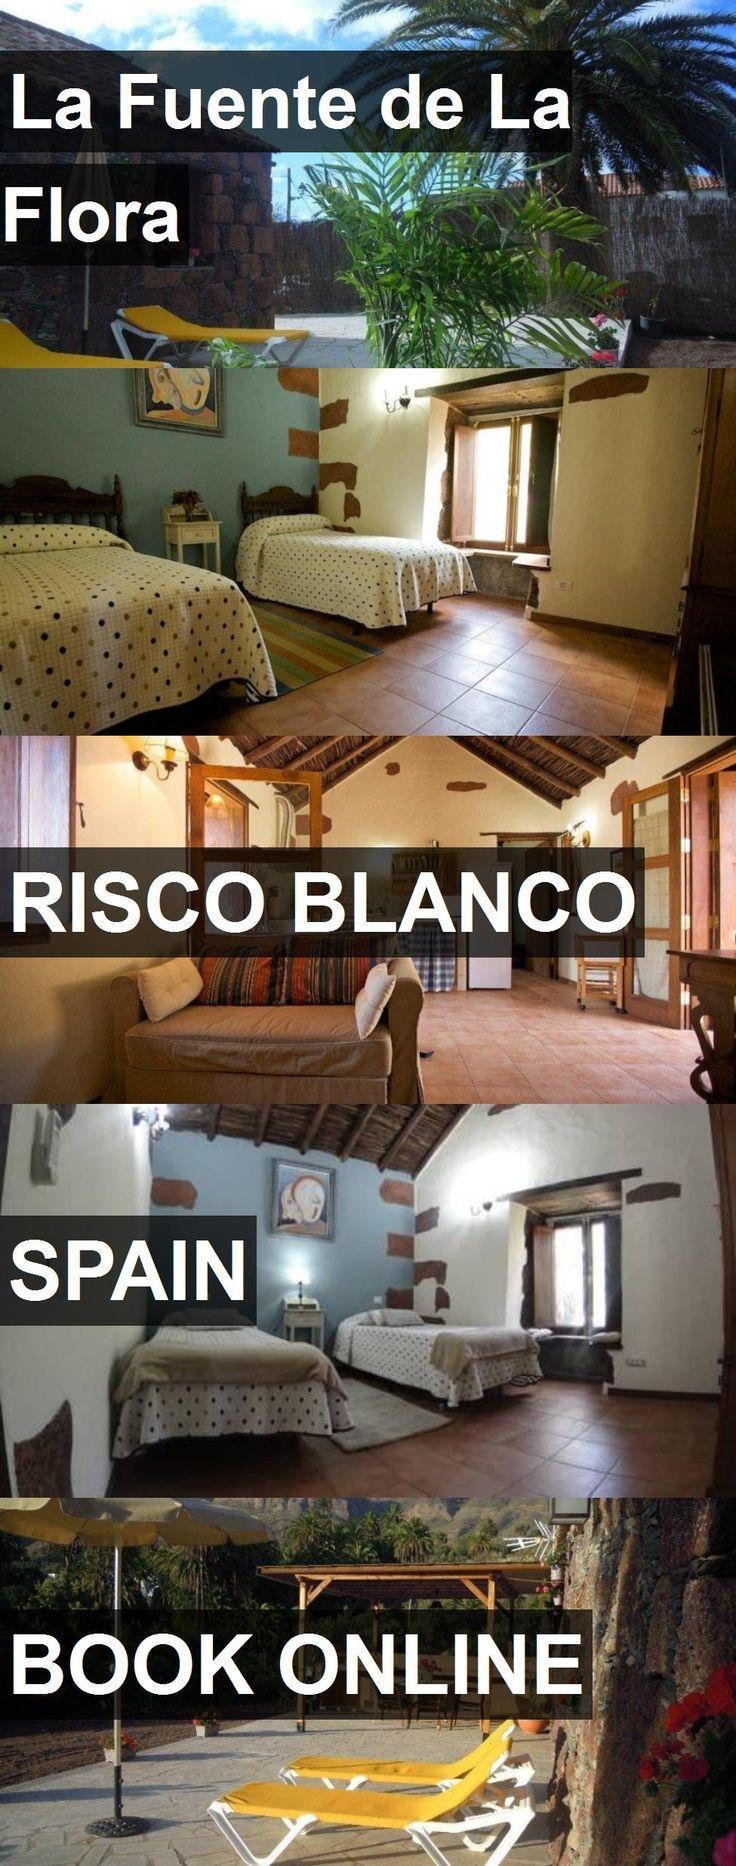 Hotel La Fuente de La Flora in Risco Blanco, Spain. For more information, photos, reviews and best prices please follow the link. #Spain #RiscoBlanco #travel #vacation #hotel